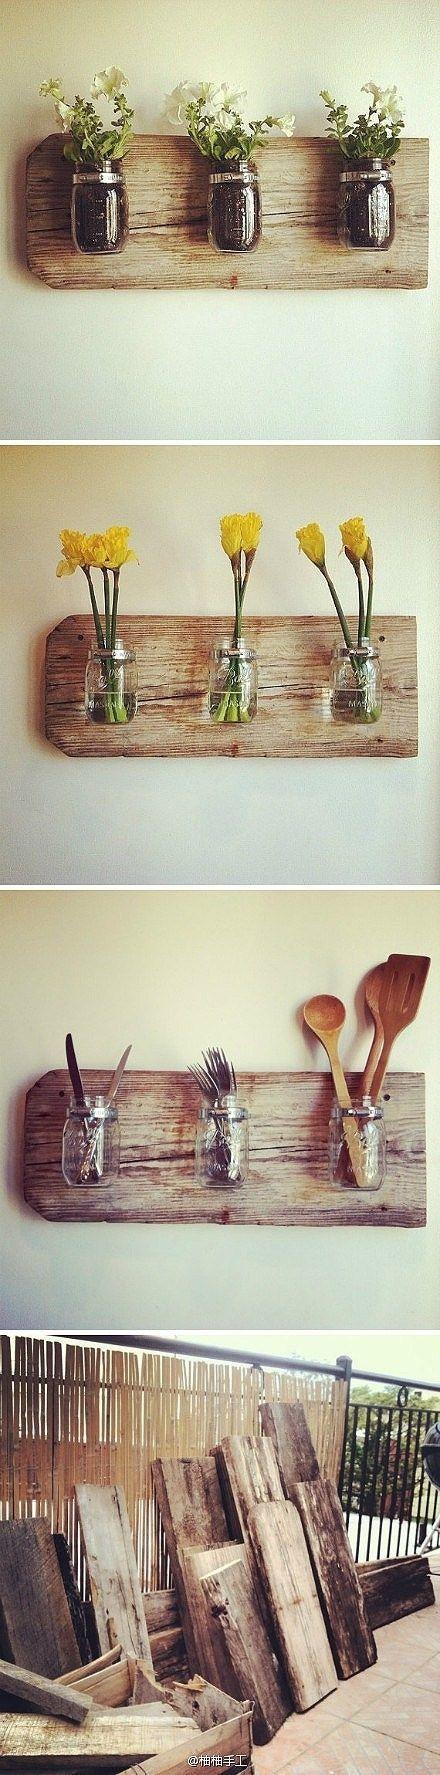 Diy Work Ideas That Make Simpler Your Kitchen 11 Diy 장식